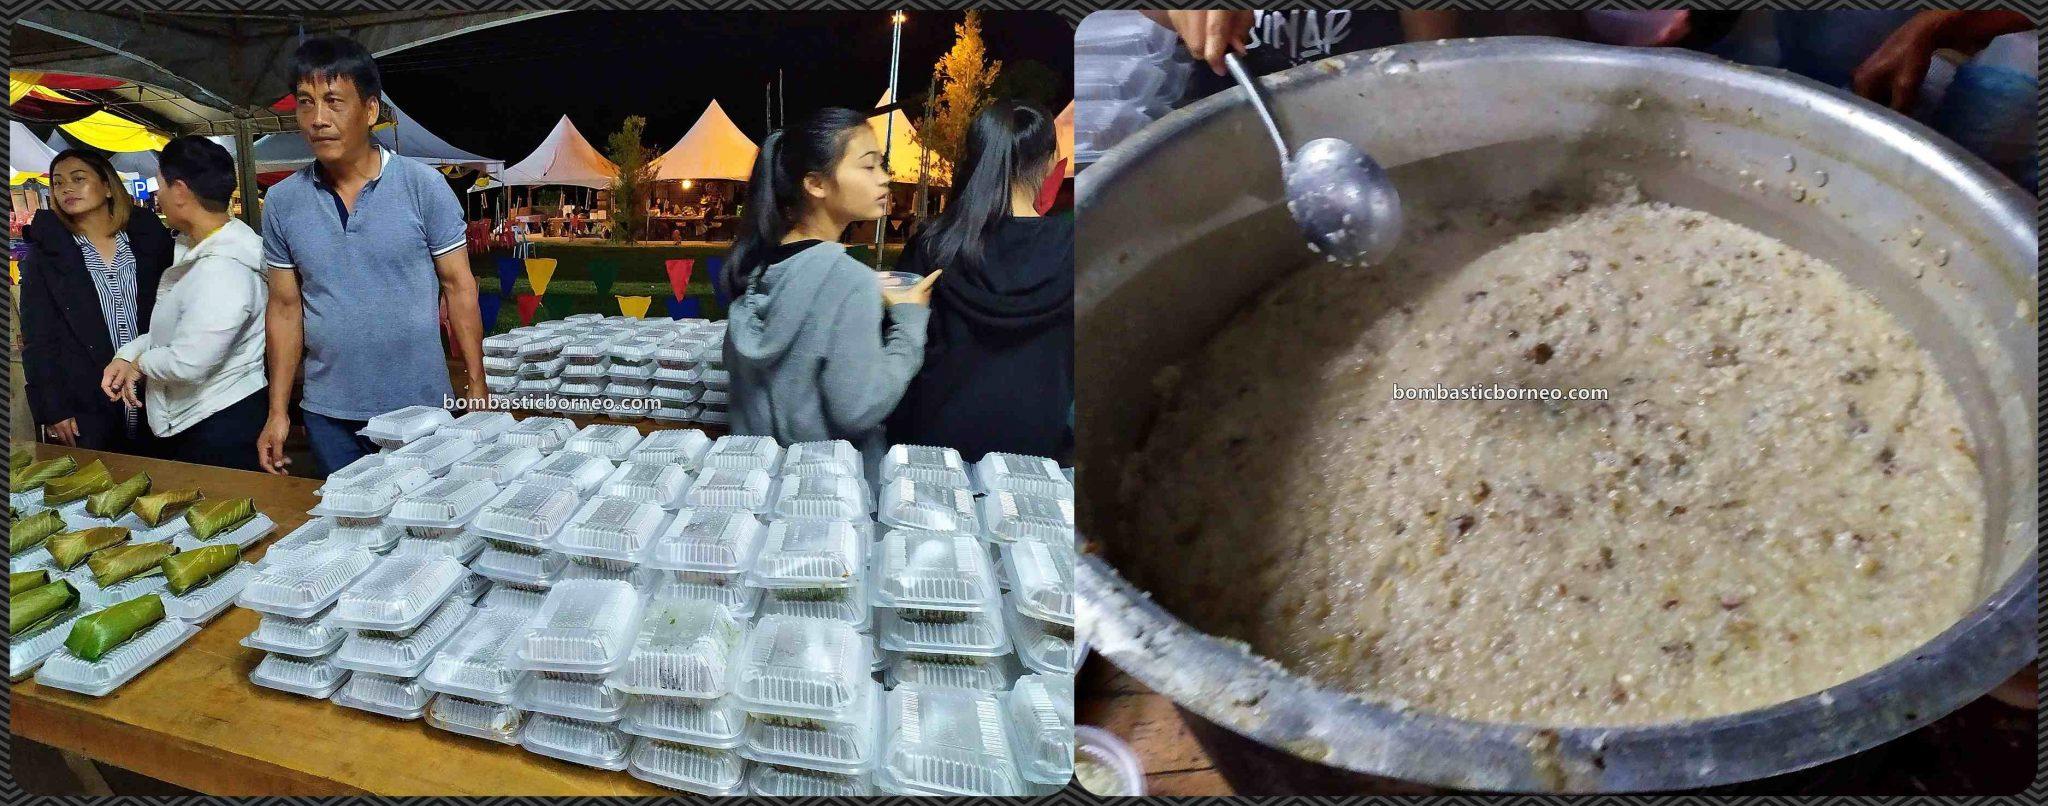 Bario Food Cultural Festival, culinary, Kelabit porridge, authentic, traditional, dayak, Ethnic, native, Orang Asal, tribe, Kelabit highlands, Malaysia, Tourism,